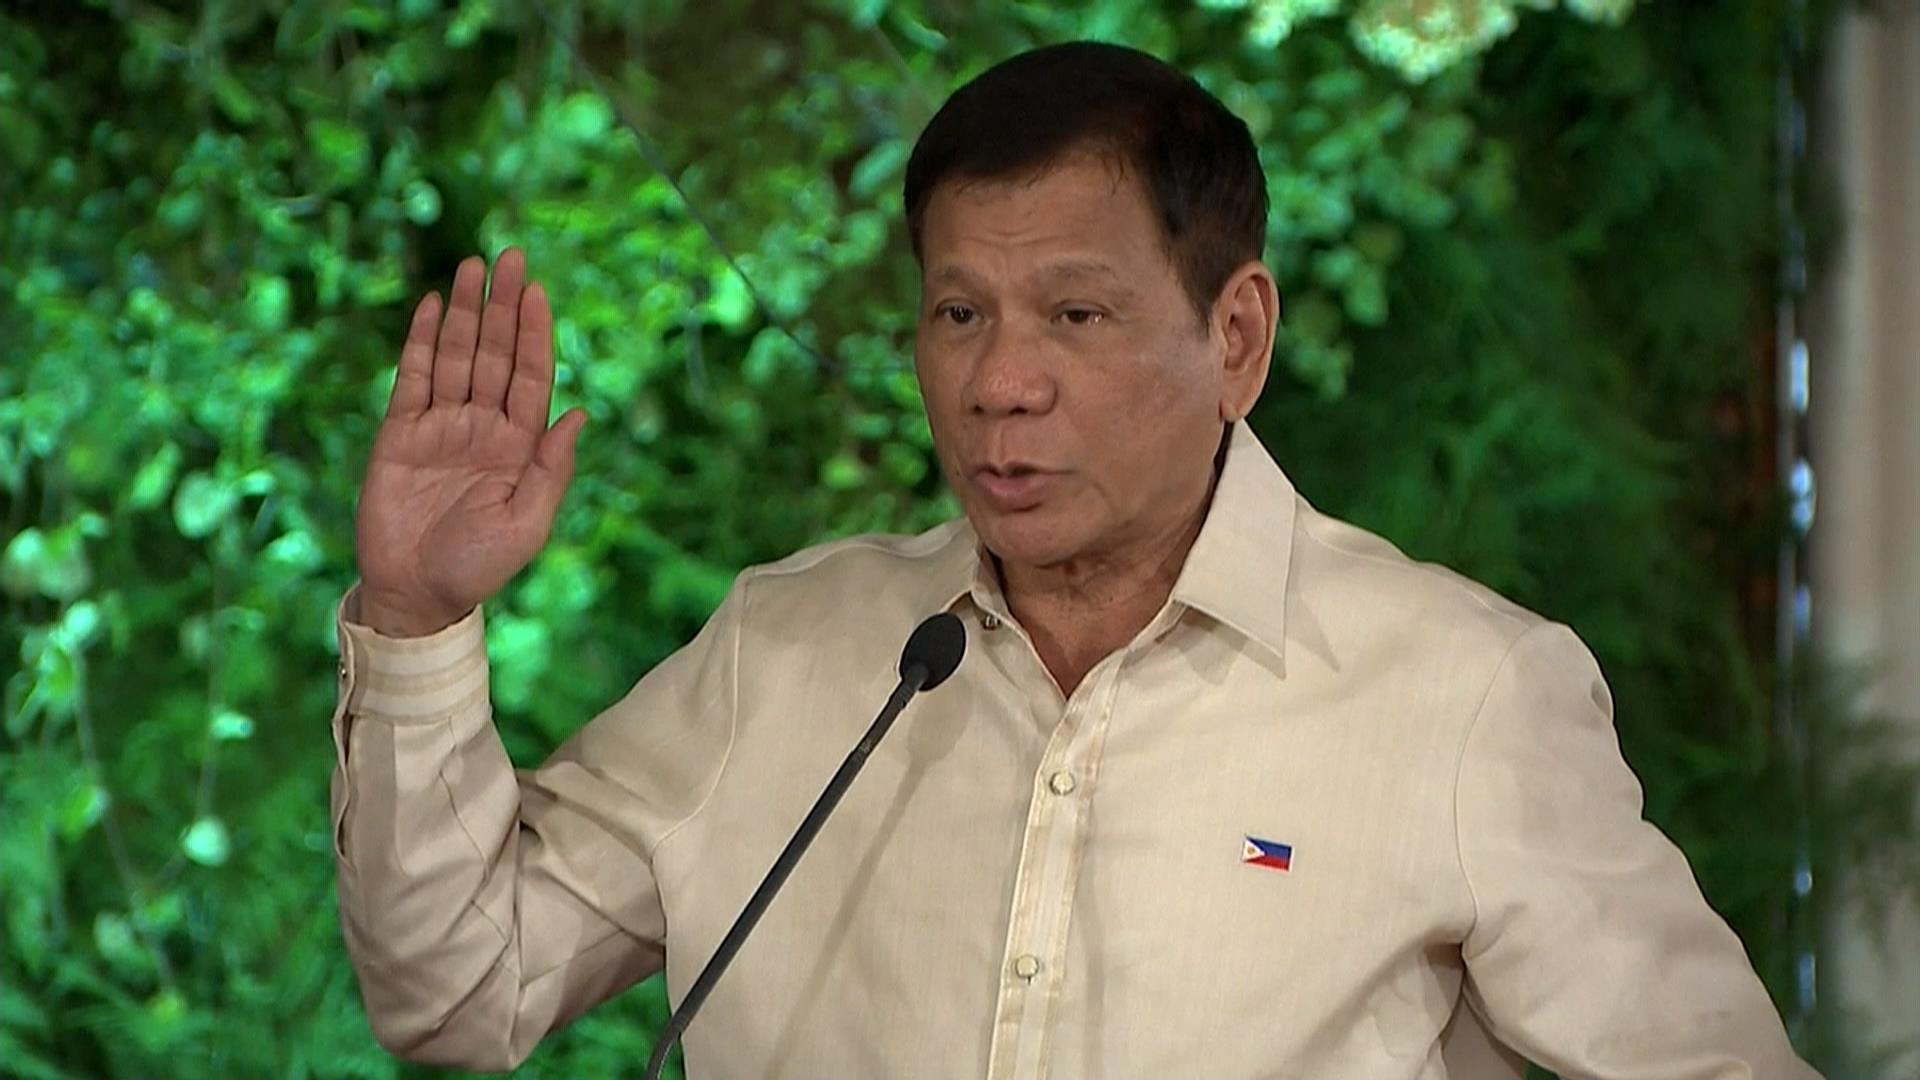 Philippines President Rodrigo Duterte Asias Trump Eyes Closer 1920x1080